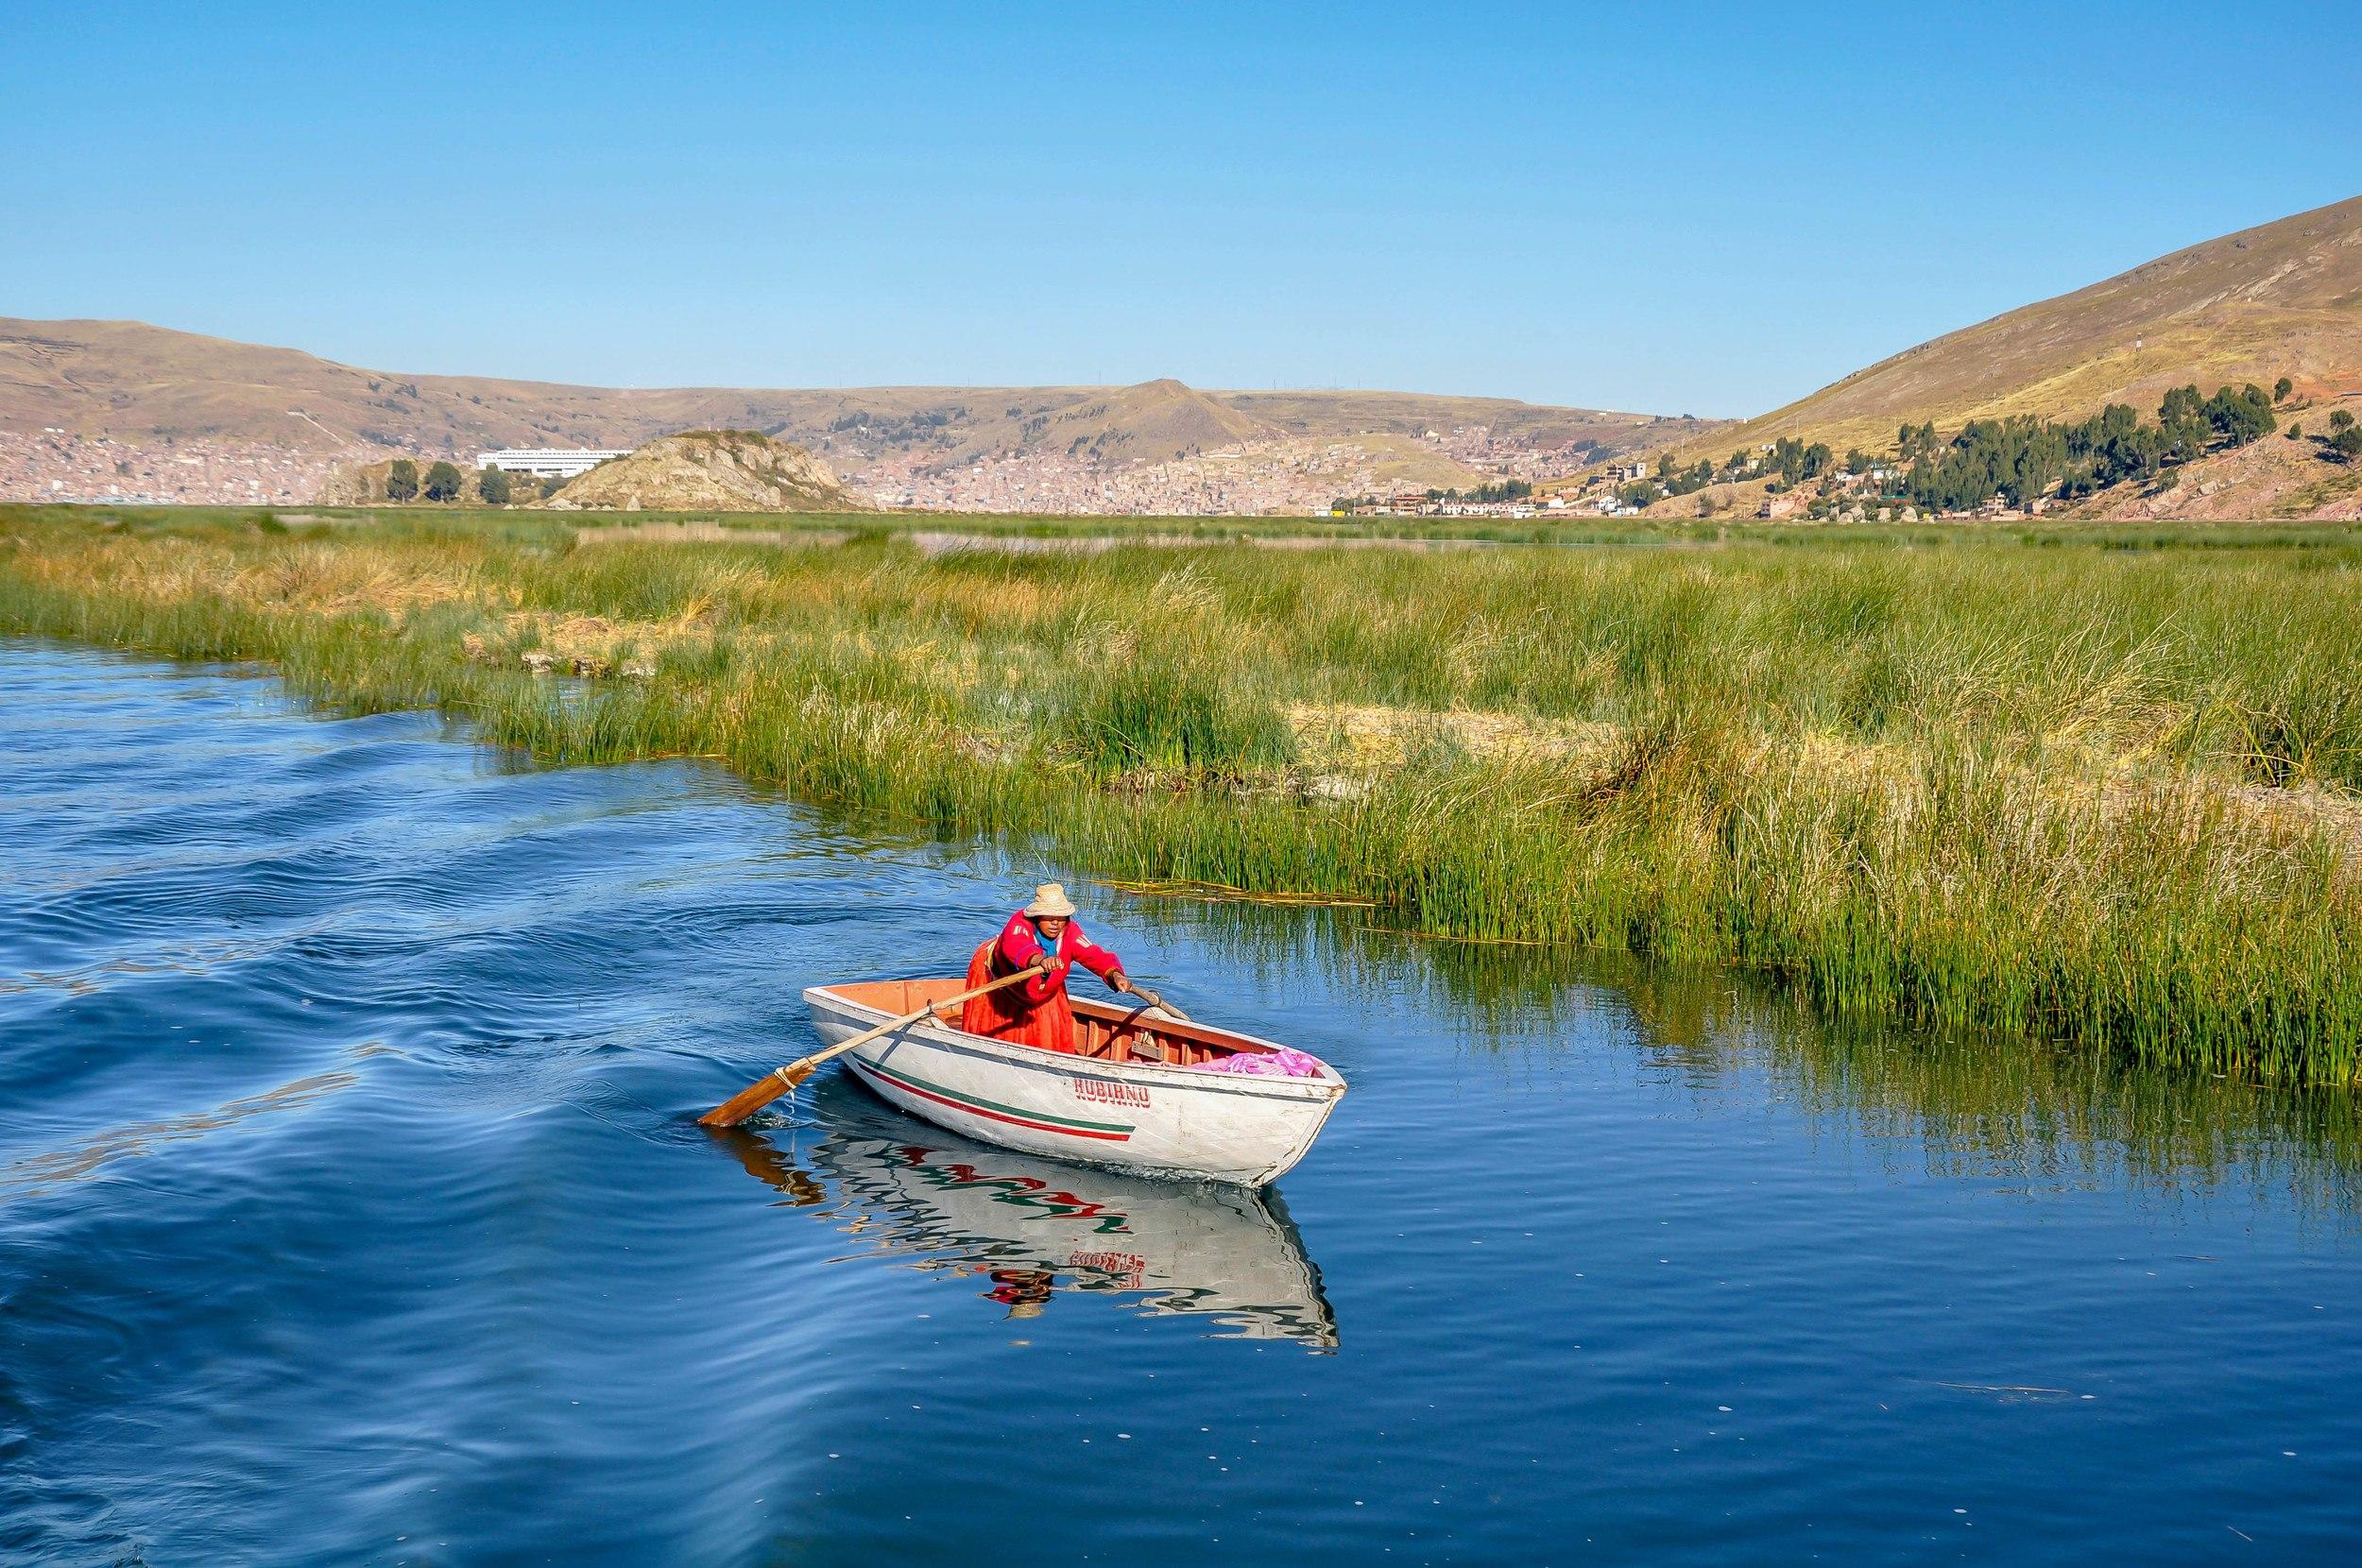 Visit Lake Titicaca with 1 week in Peru